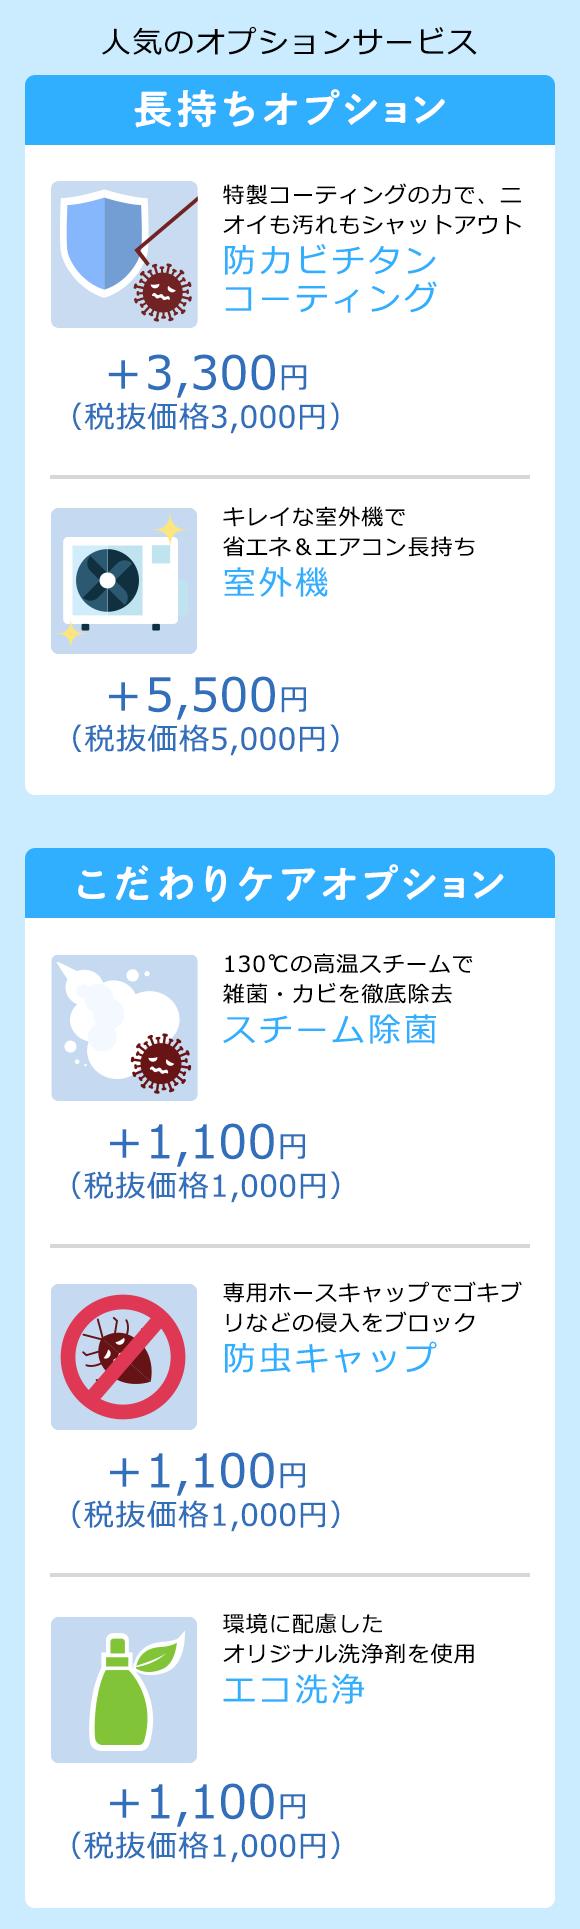 sp_2103aircon_09